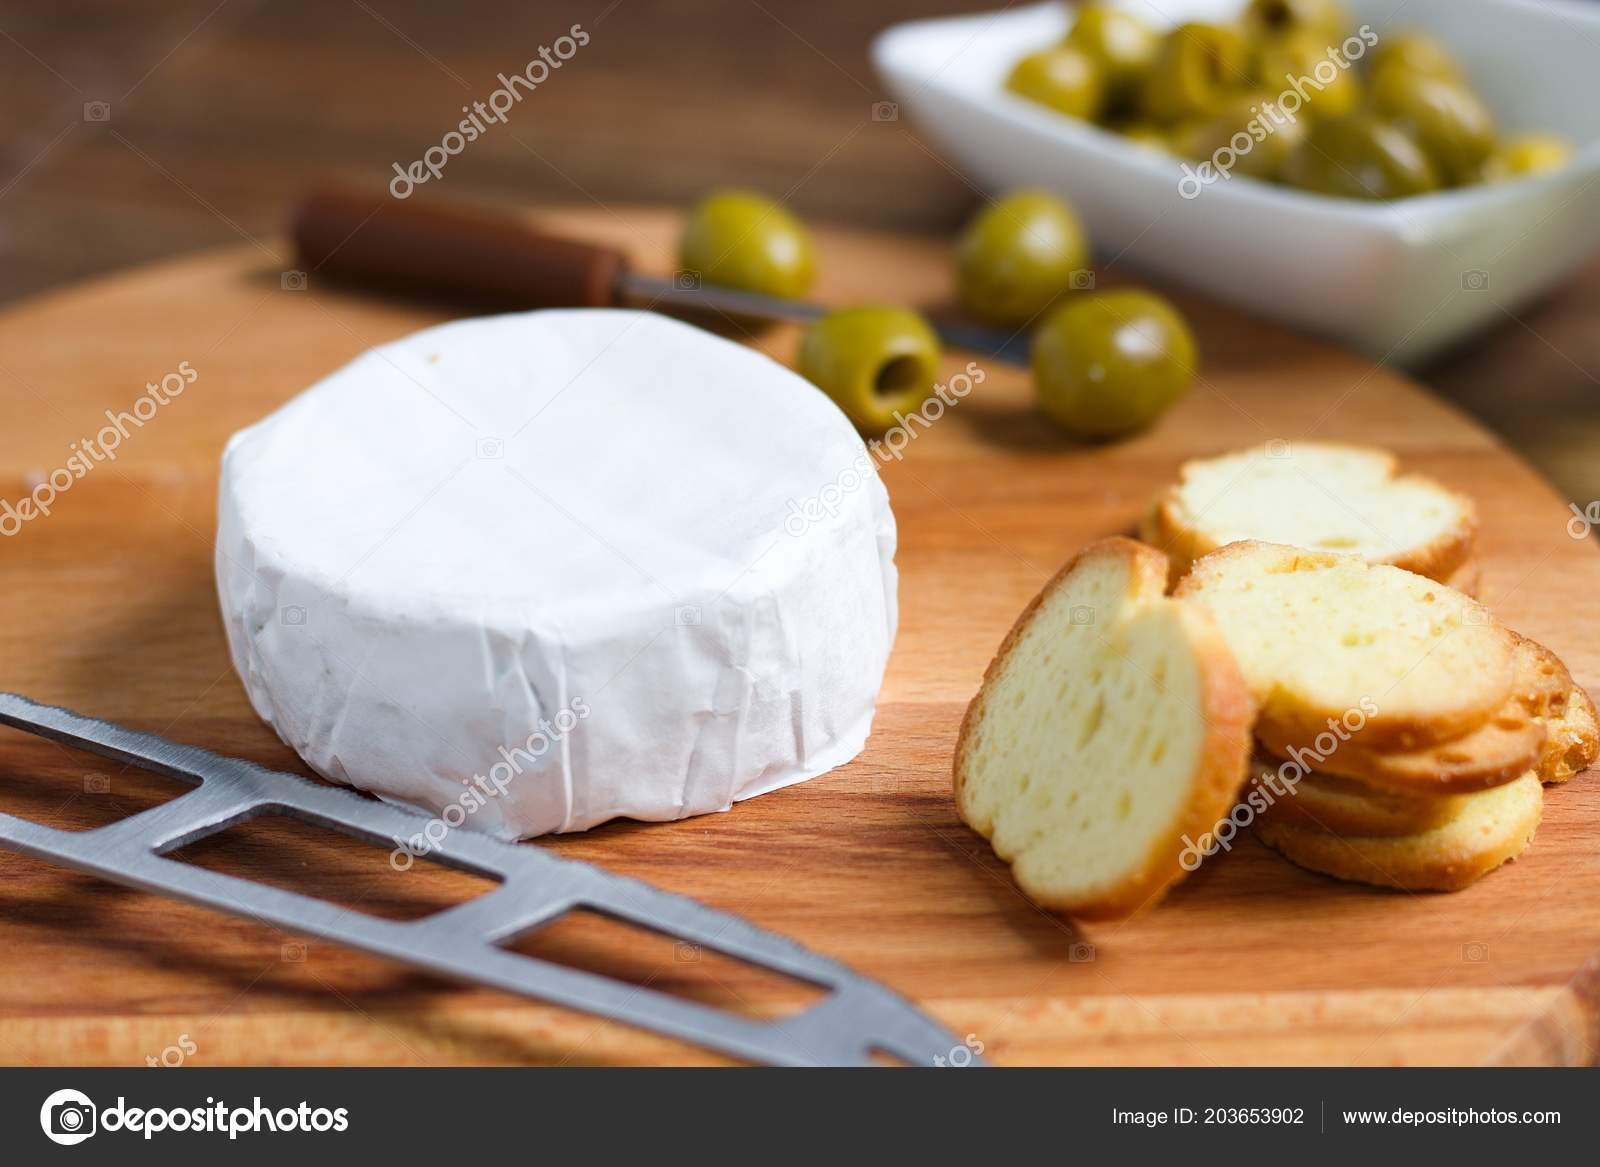 Detail Whole Wheel Soft Cheese White Rind Camembert Brie Concept Stock Photo C Iseinor Seznam Cz 203653902